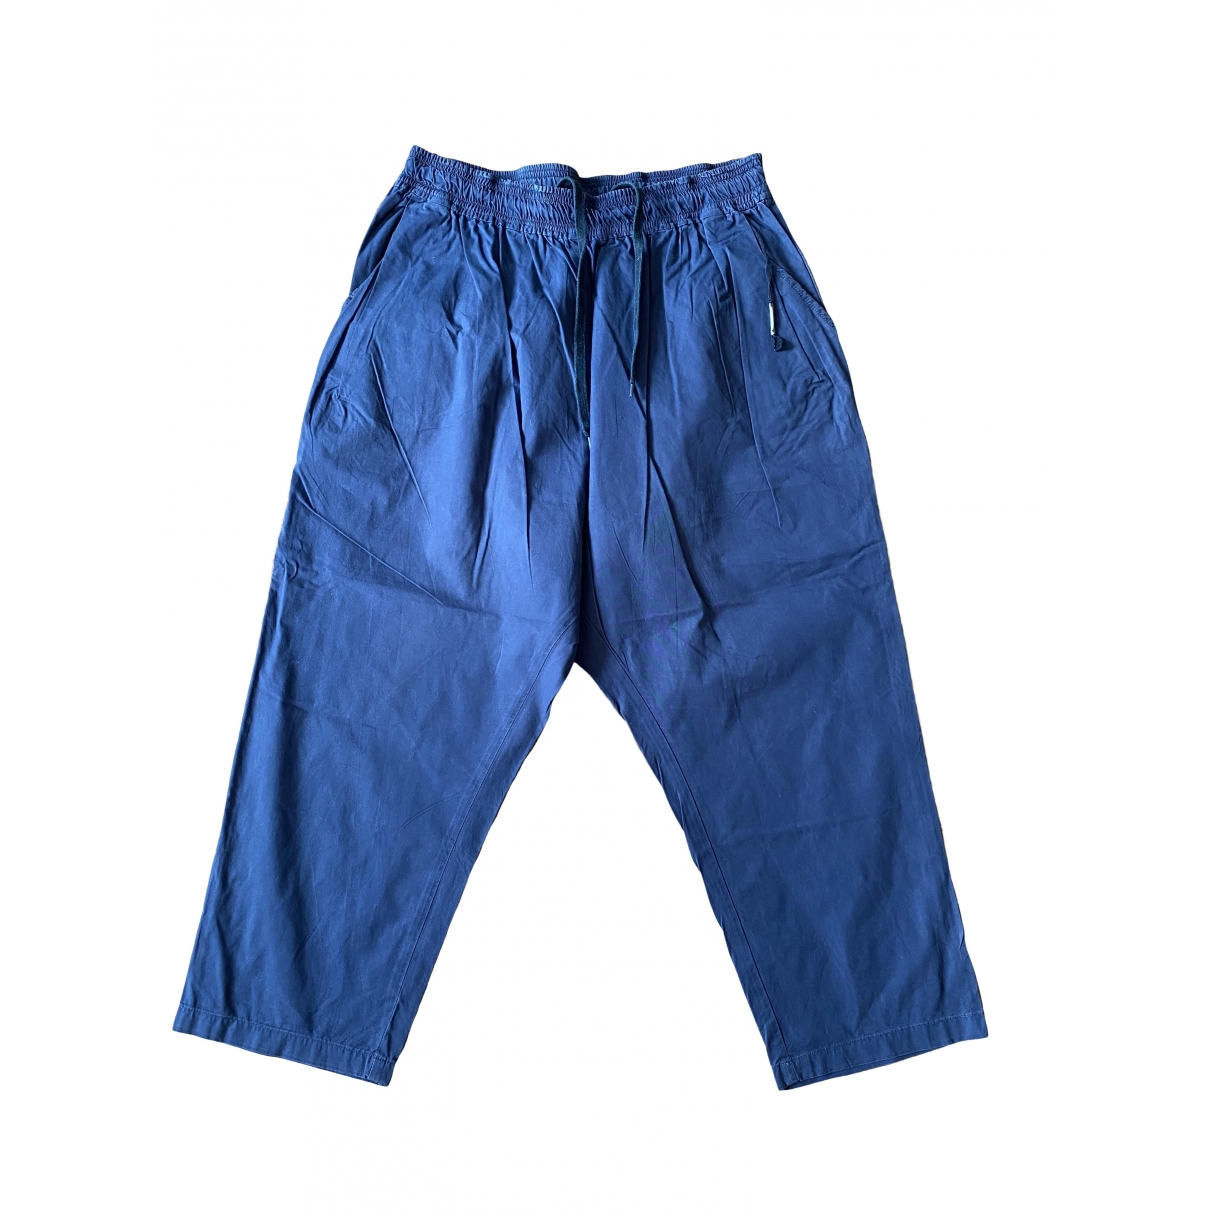 Damir Doma \N Black Cotton Trousers for Men M International